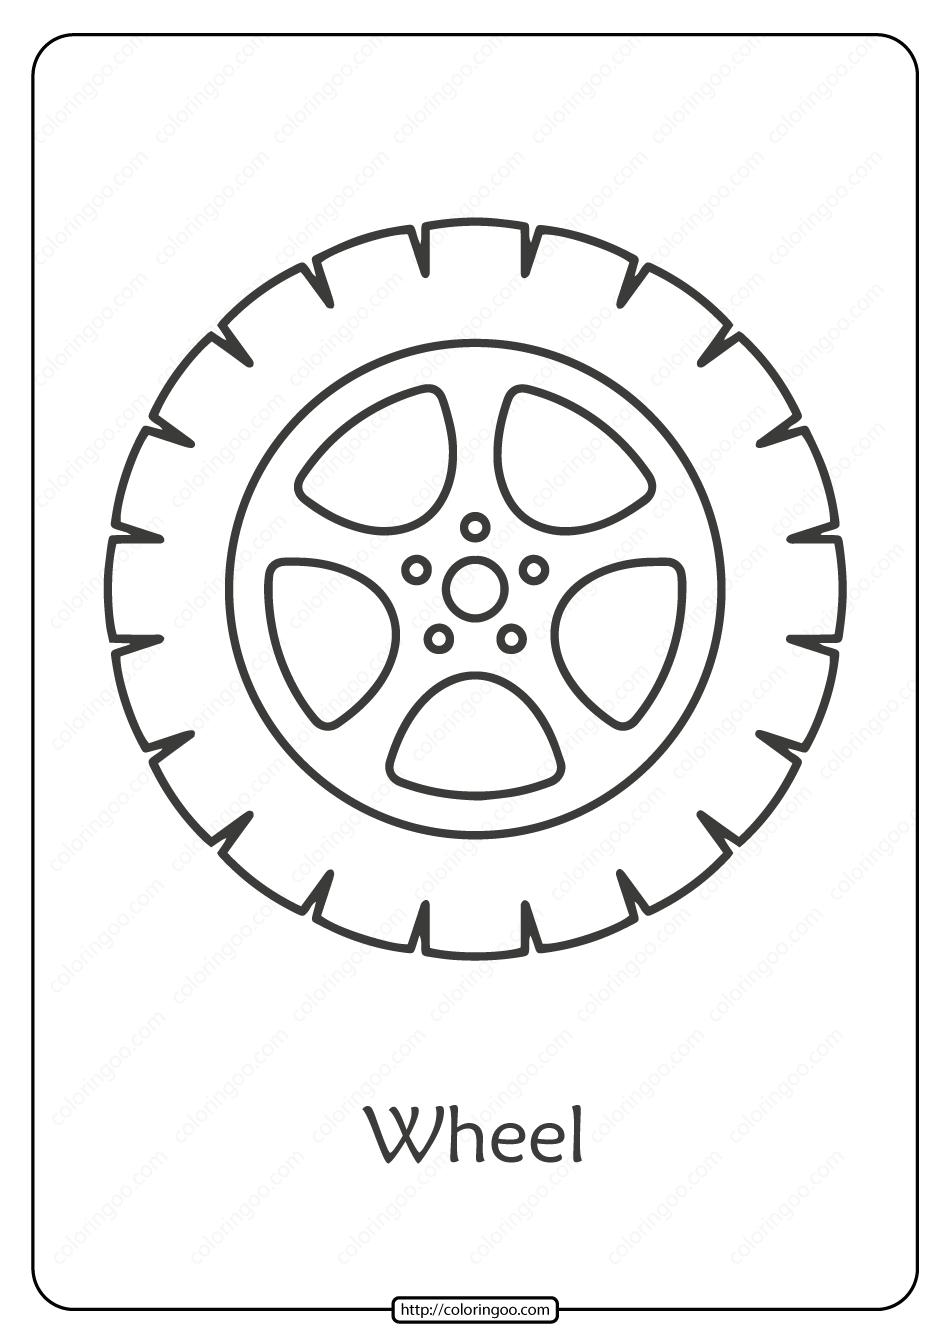 Free Printable Car Wheel Pdf Coloring Page Stencil Templates Templates Printable Free Wheel Cake